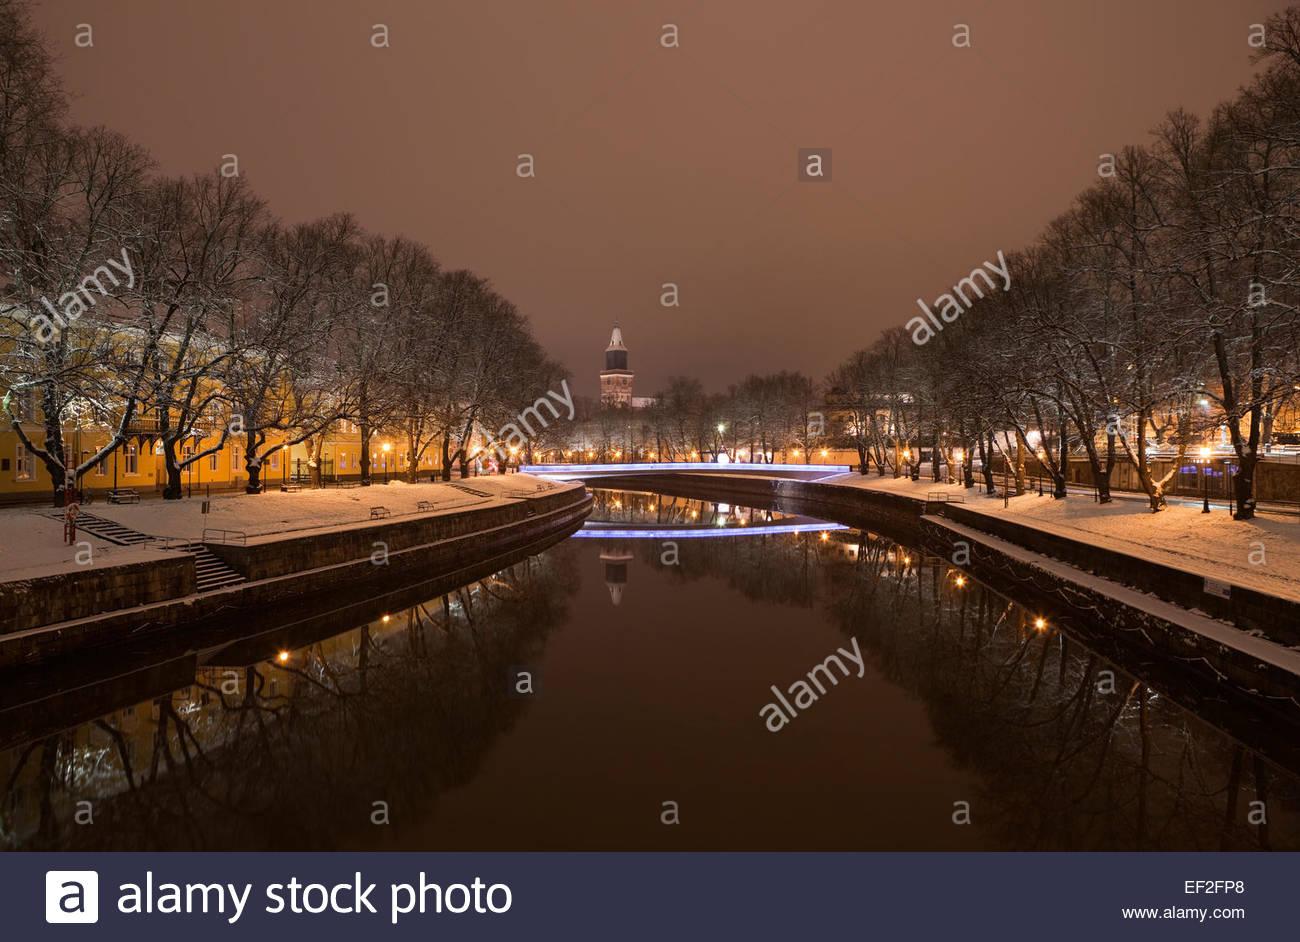 The new bridge over river Aura in Turku - Stock Image